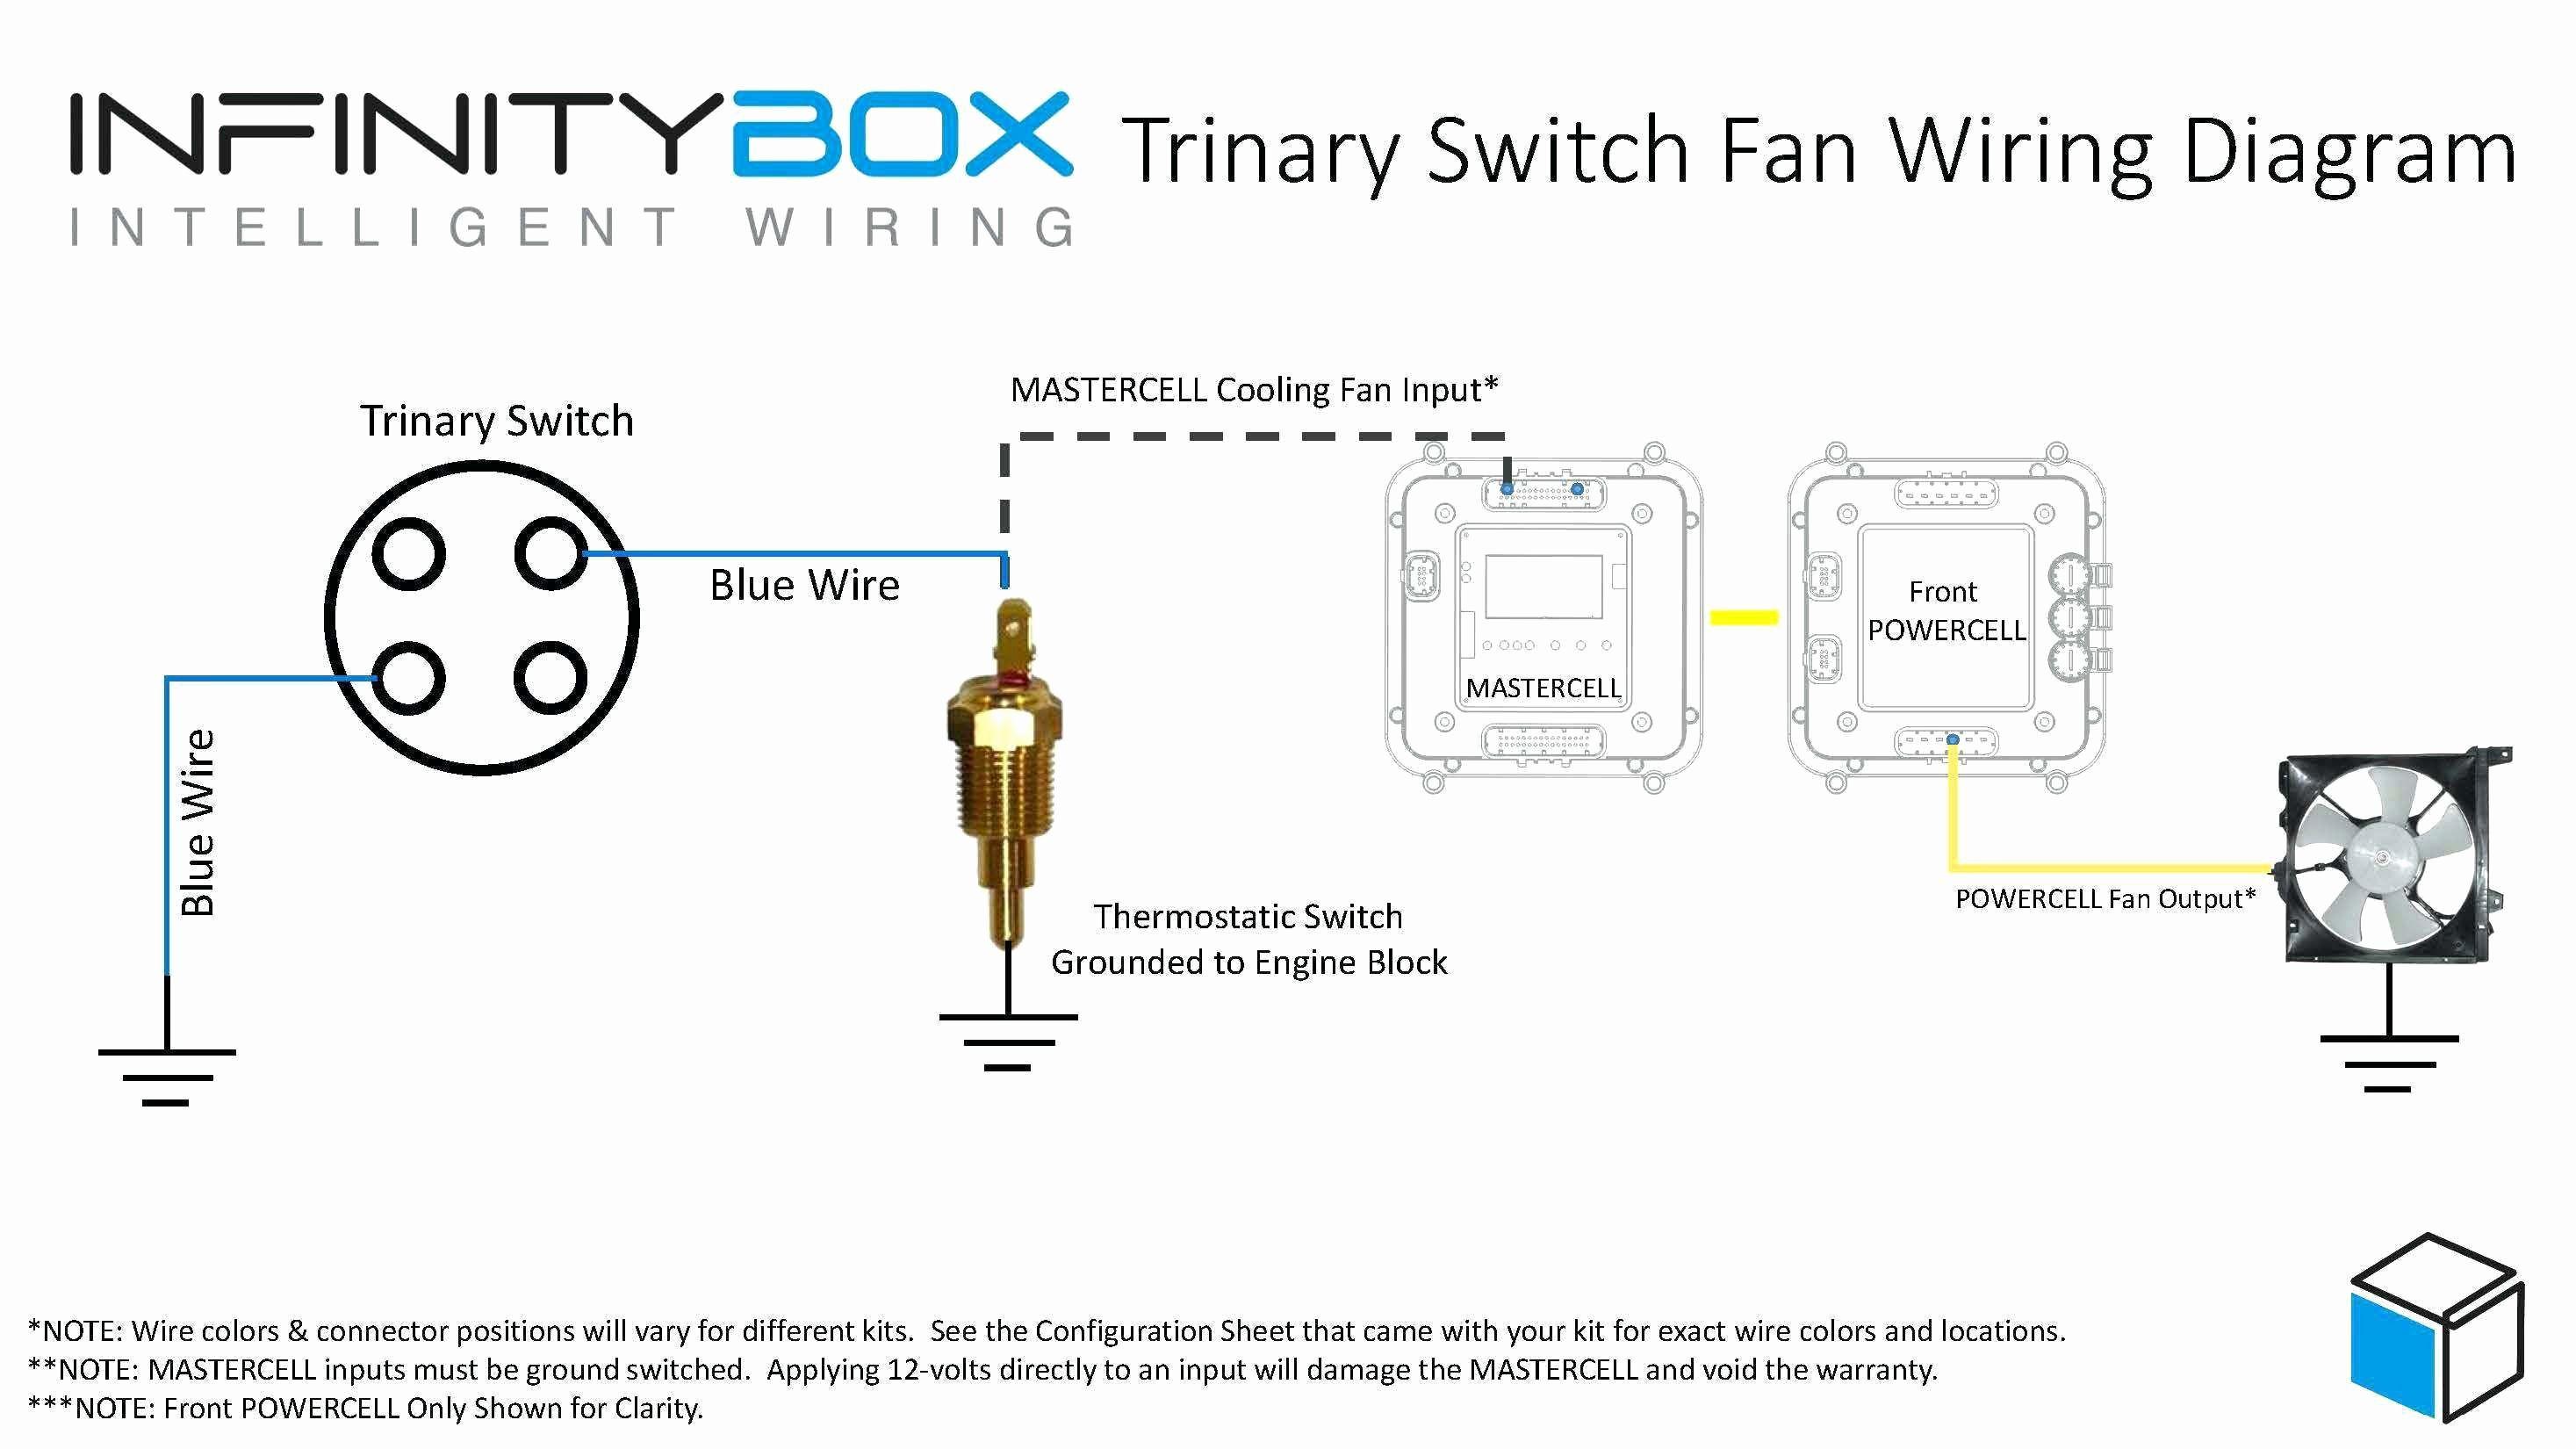 Nema L14-30 Plug Wiring Diagram from annawiringdiagram.com